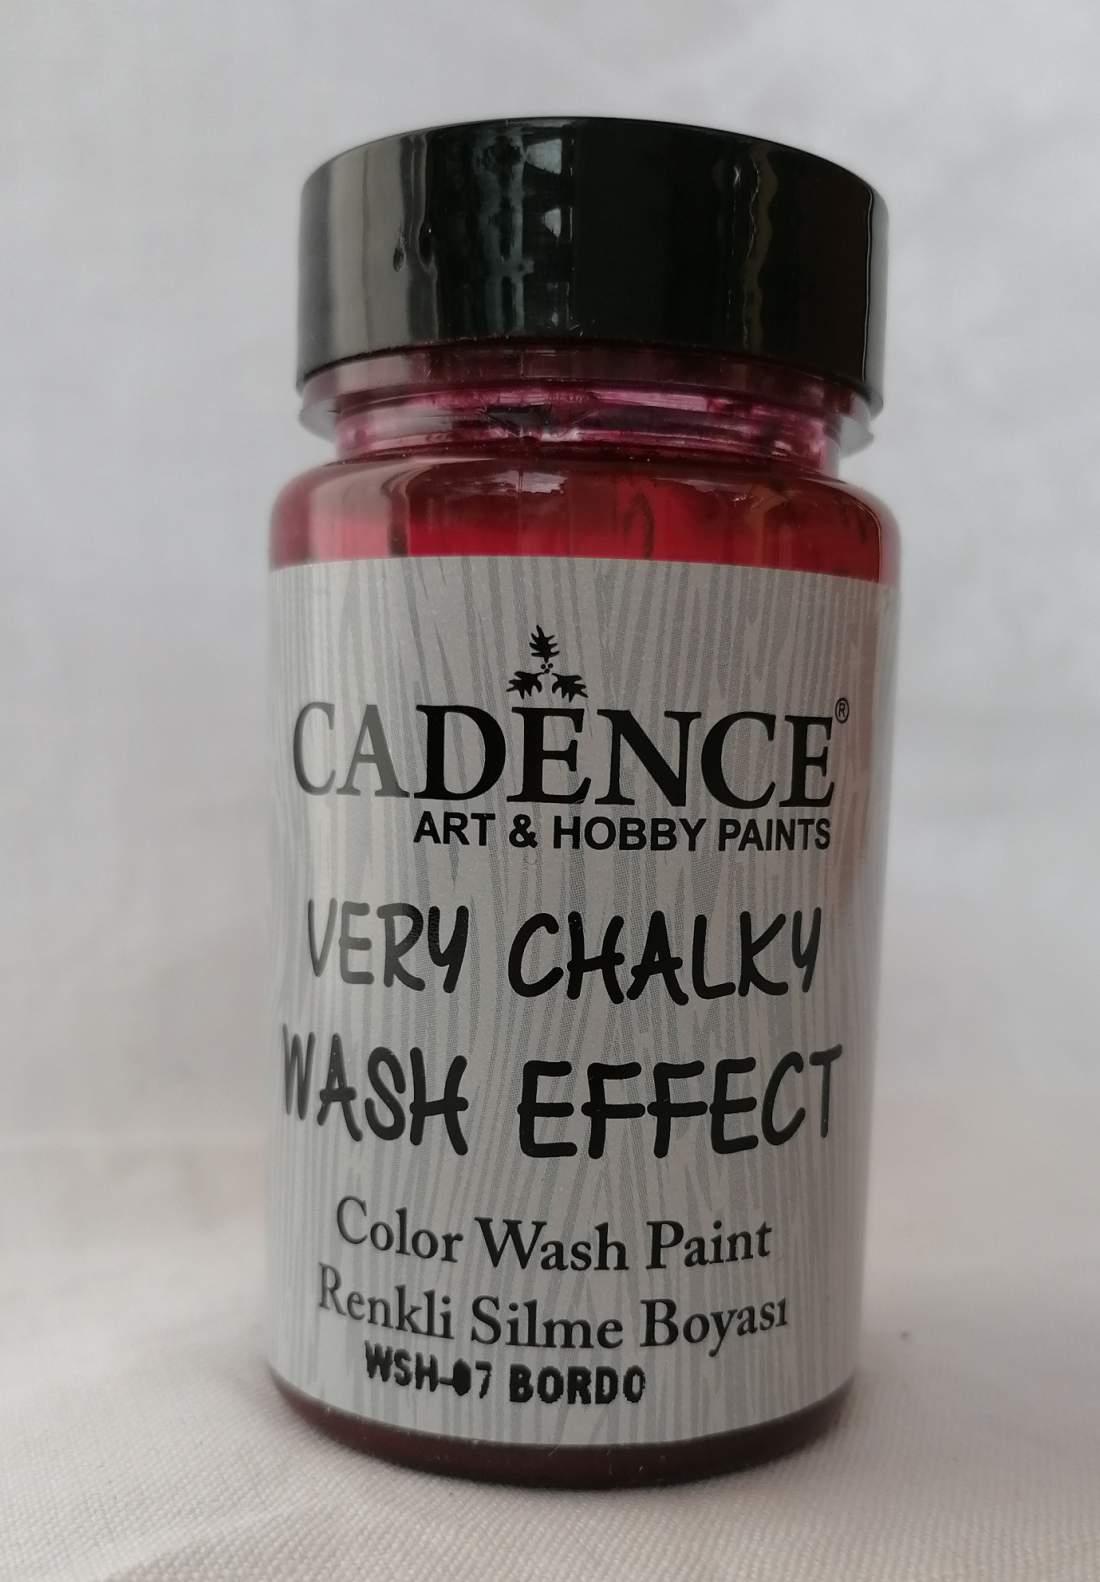 Very chalky wash effekt - bordó